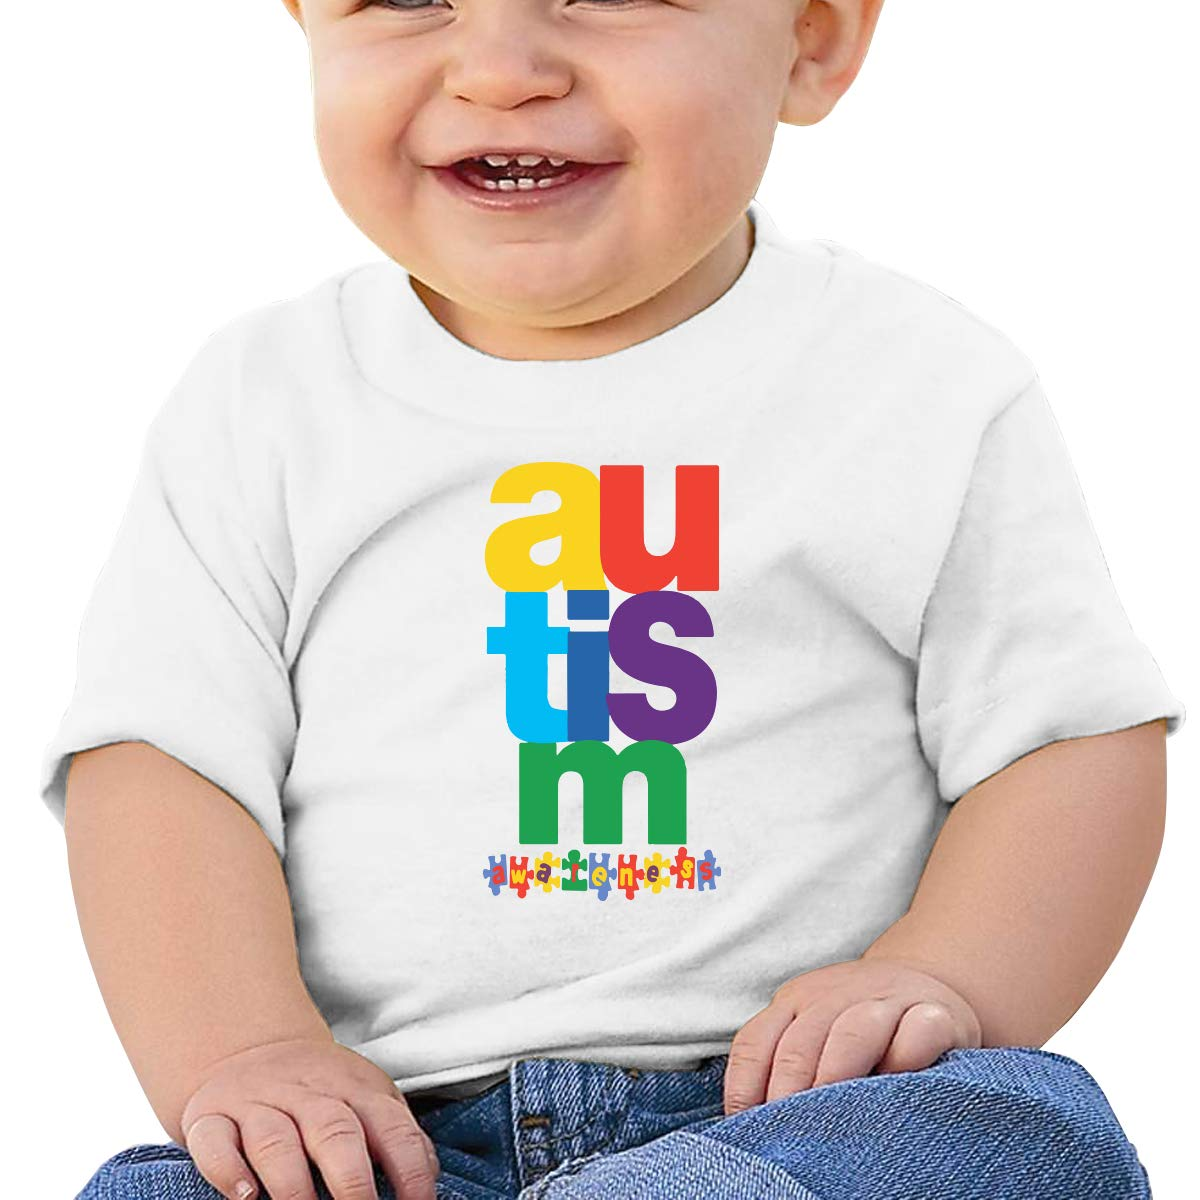 Autism Awareness Baby Boys Girls Short Sleeve Crew Neck Tee Shirt 6-18 Month Tops